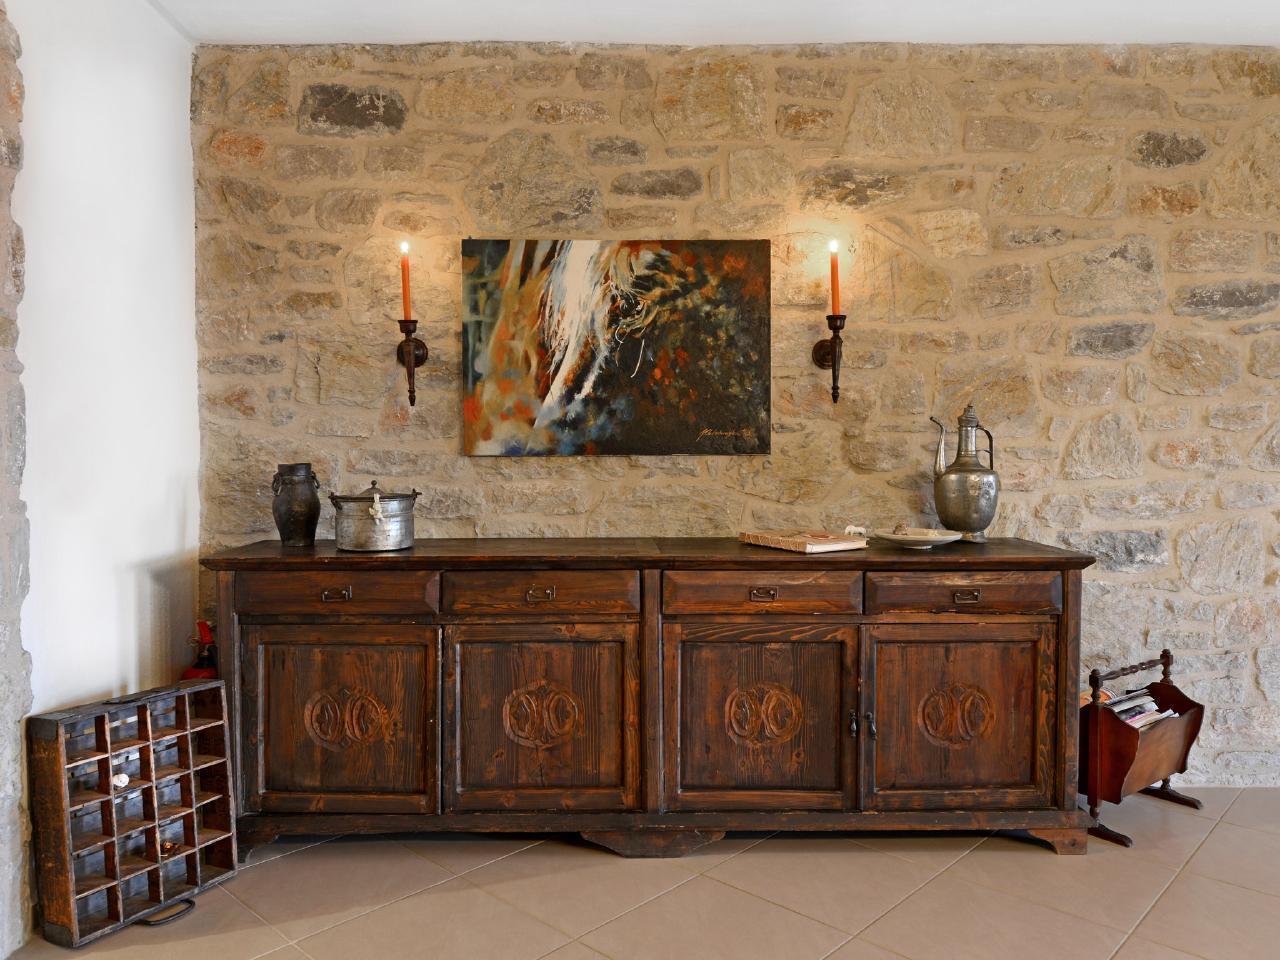 Maison de vacances Exklusives Chalet, romantisch am Berghang und Meer gelegen (2506674), Mesudiye, , Région Egéenne, Turquie, image 19